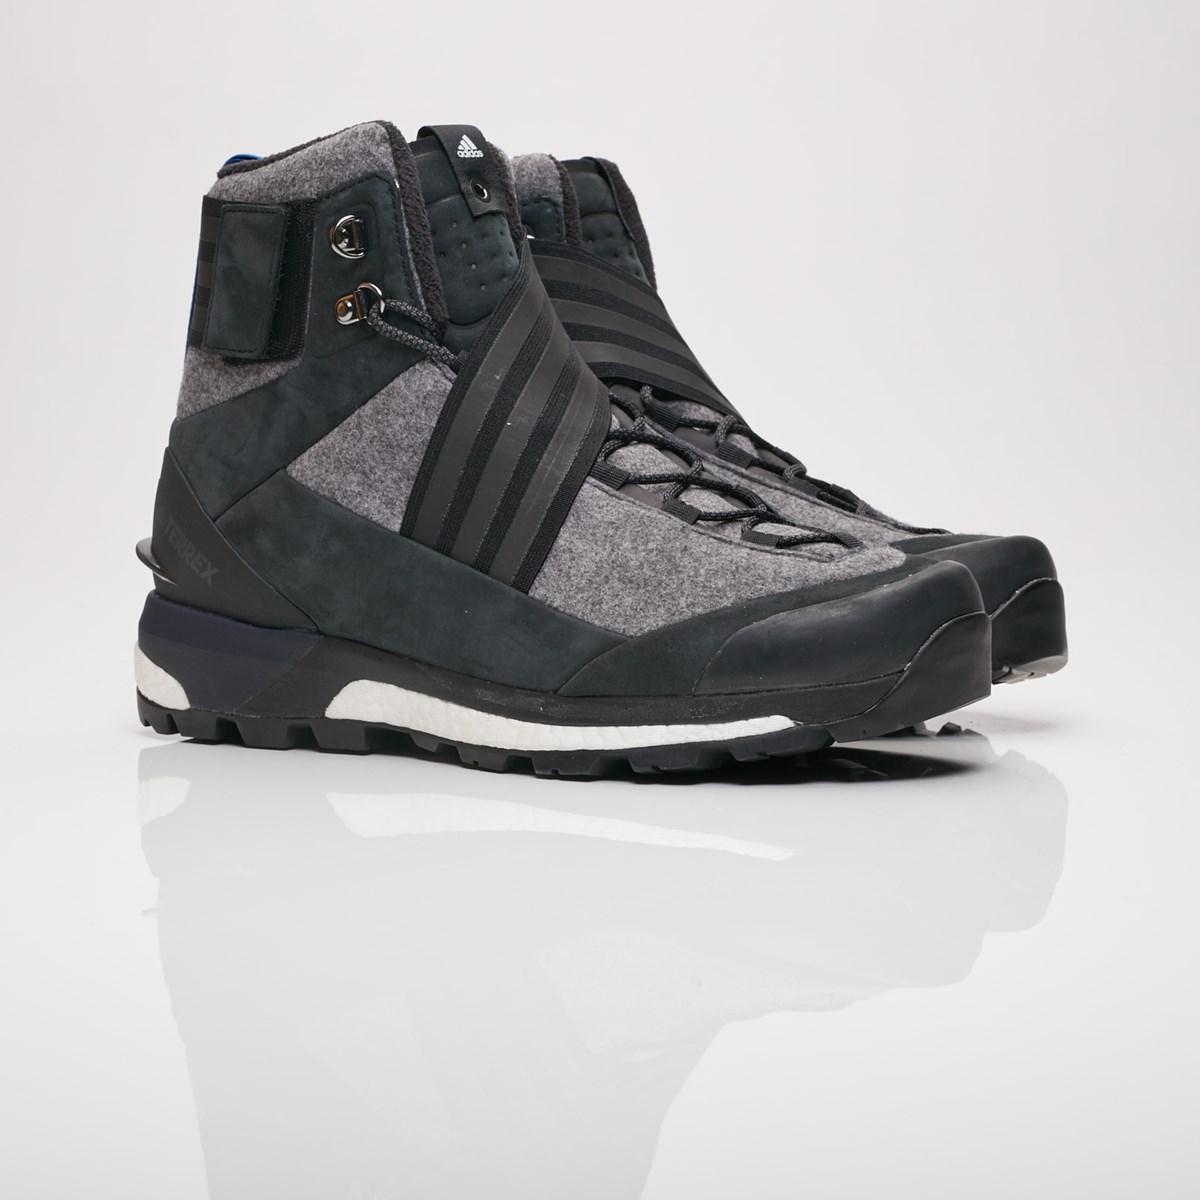 low priced 81223 0844b adidas Terrex Tracefinder x XHIBITION - Cm7881 - Sneakersnstuff   sneakers    streetwear online since 1999